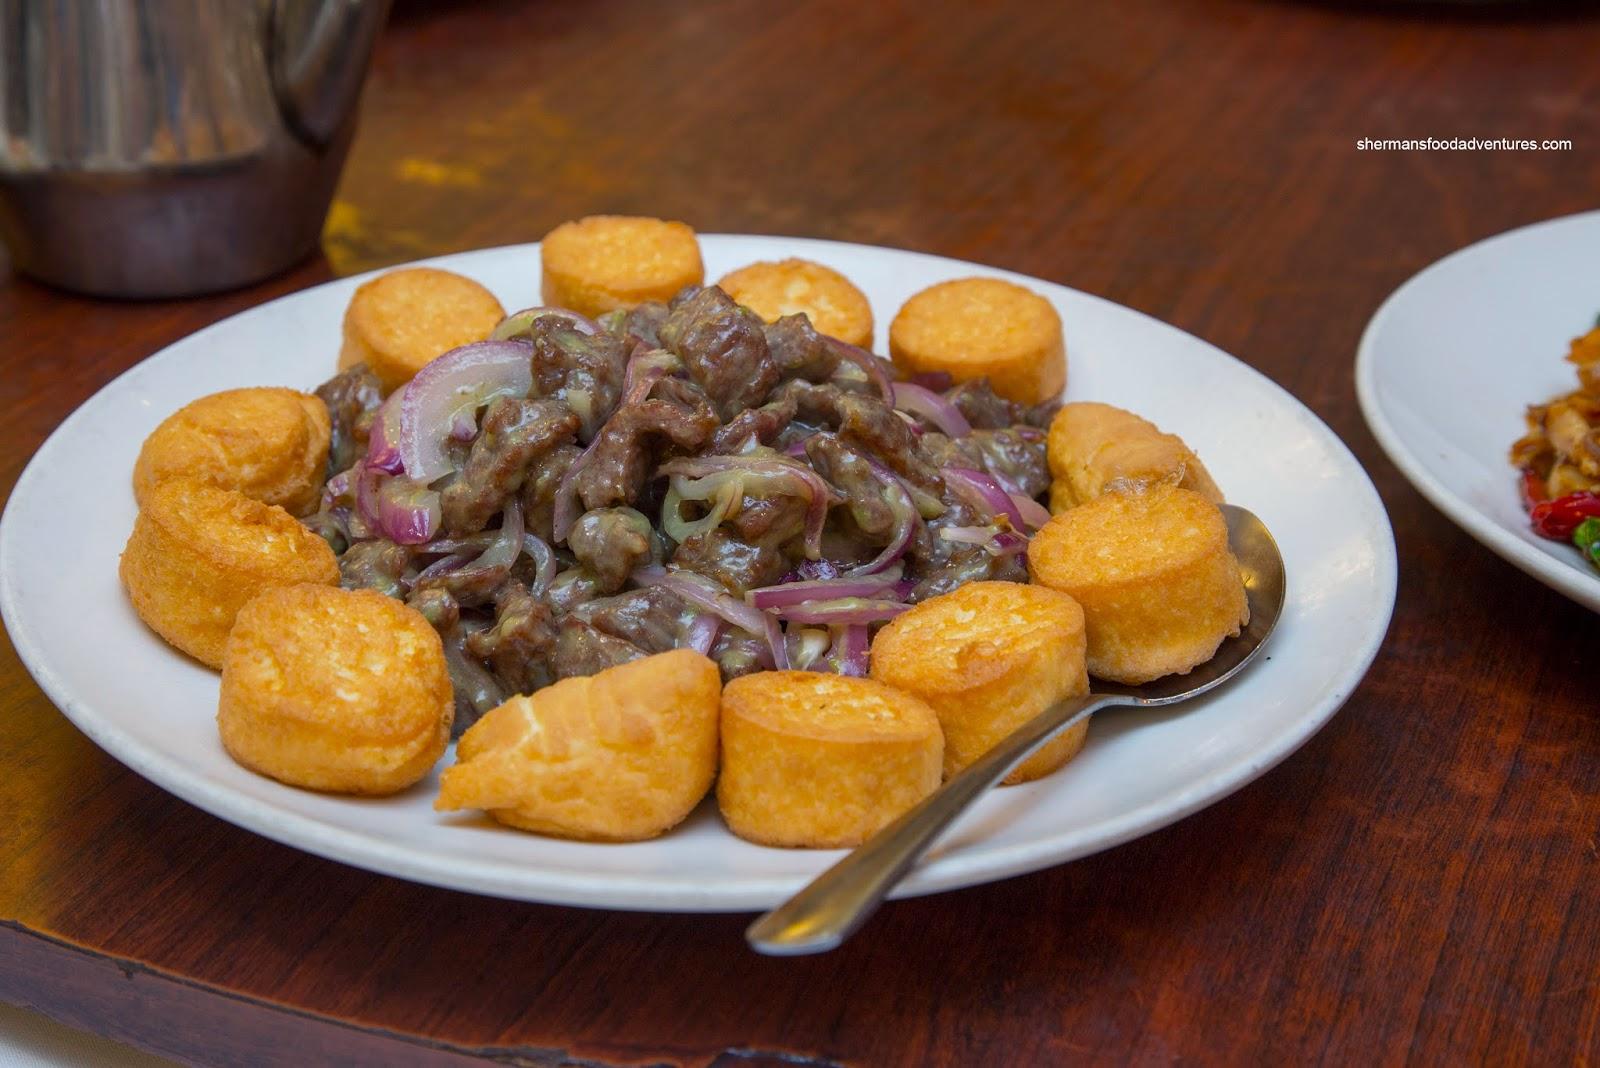 Shermans Food Adventures Mayflower Seafood Restaurant # Wasbak Zeef_202434